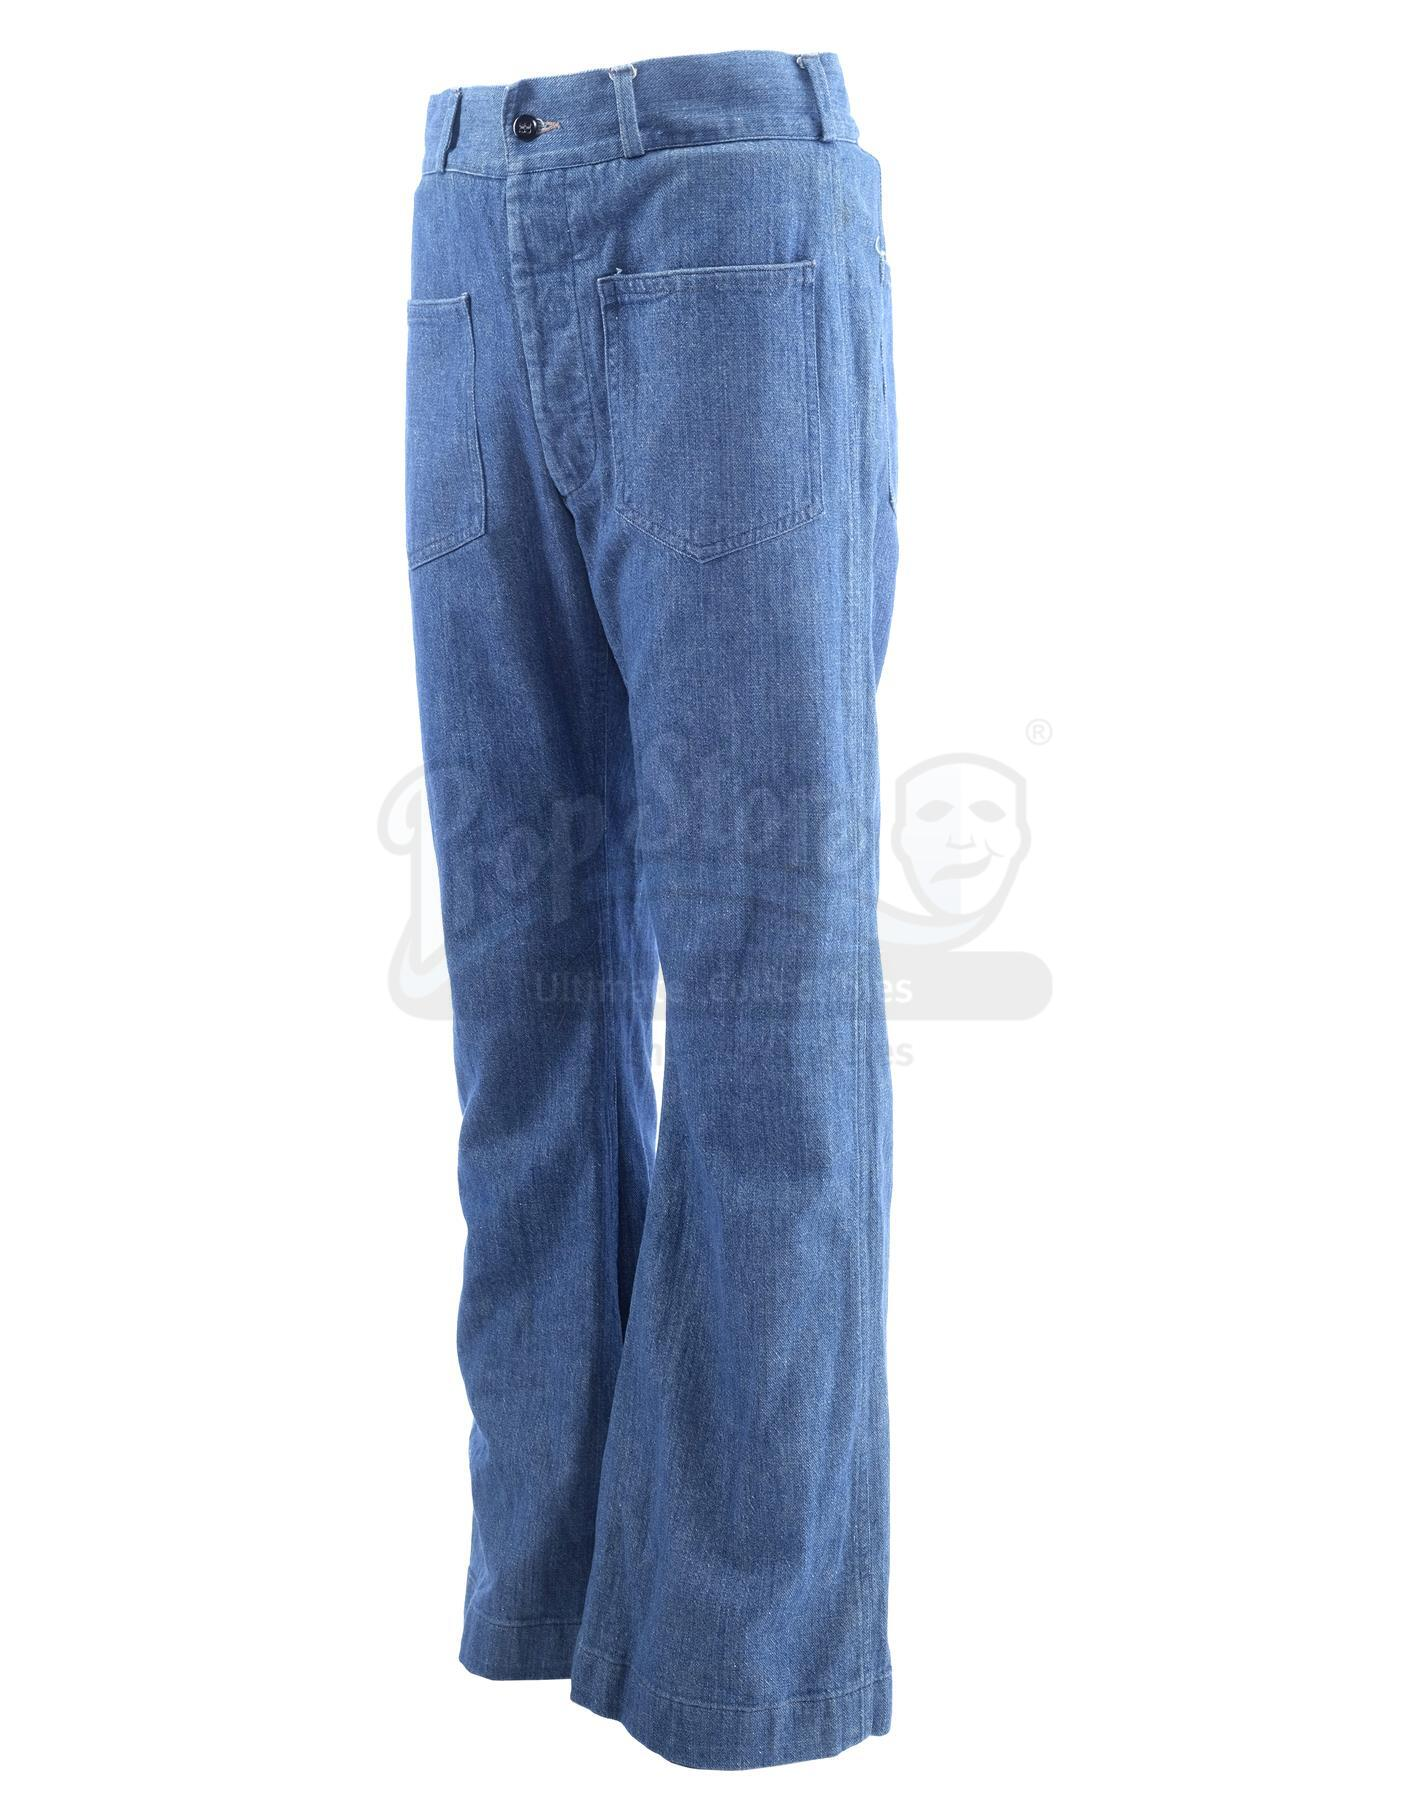 Lot # 1005: THE SAND PEBBLES - Jake Holman's (Steve McQueen) Jeans - Image 4 of 11